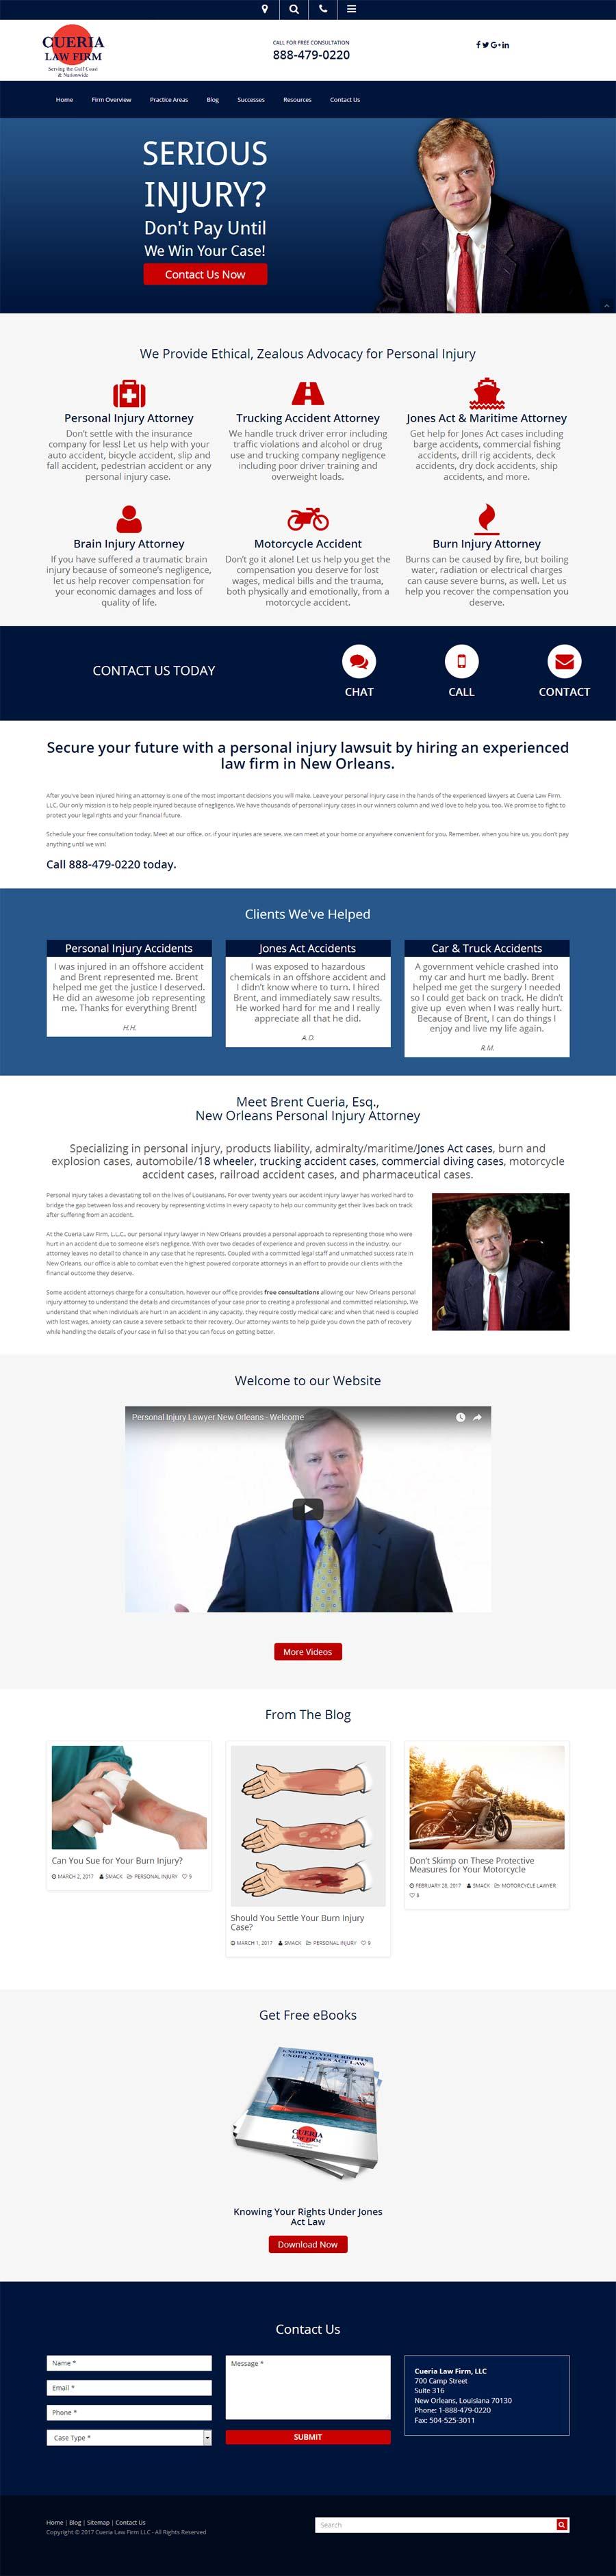 Mishap or malpractice ebook array legal content writers iwebcontent rh iwebcontent com fandeluxe Images